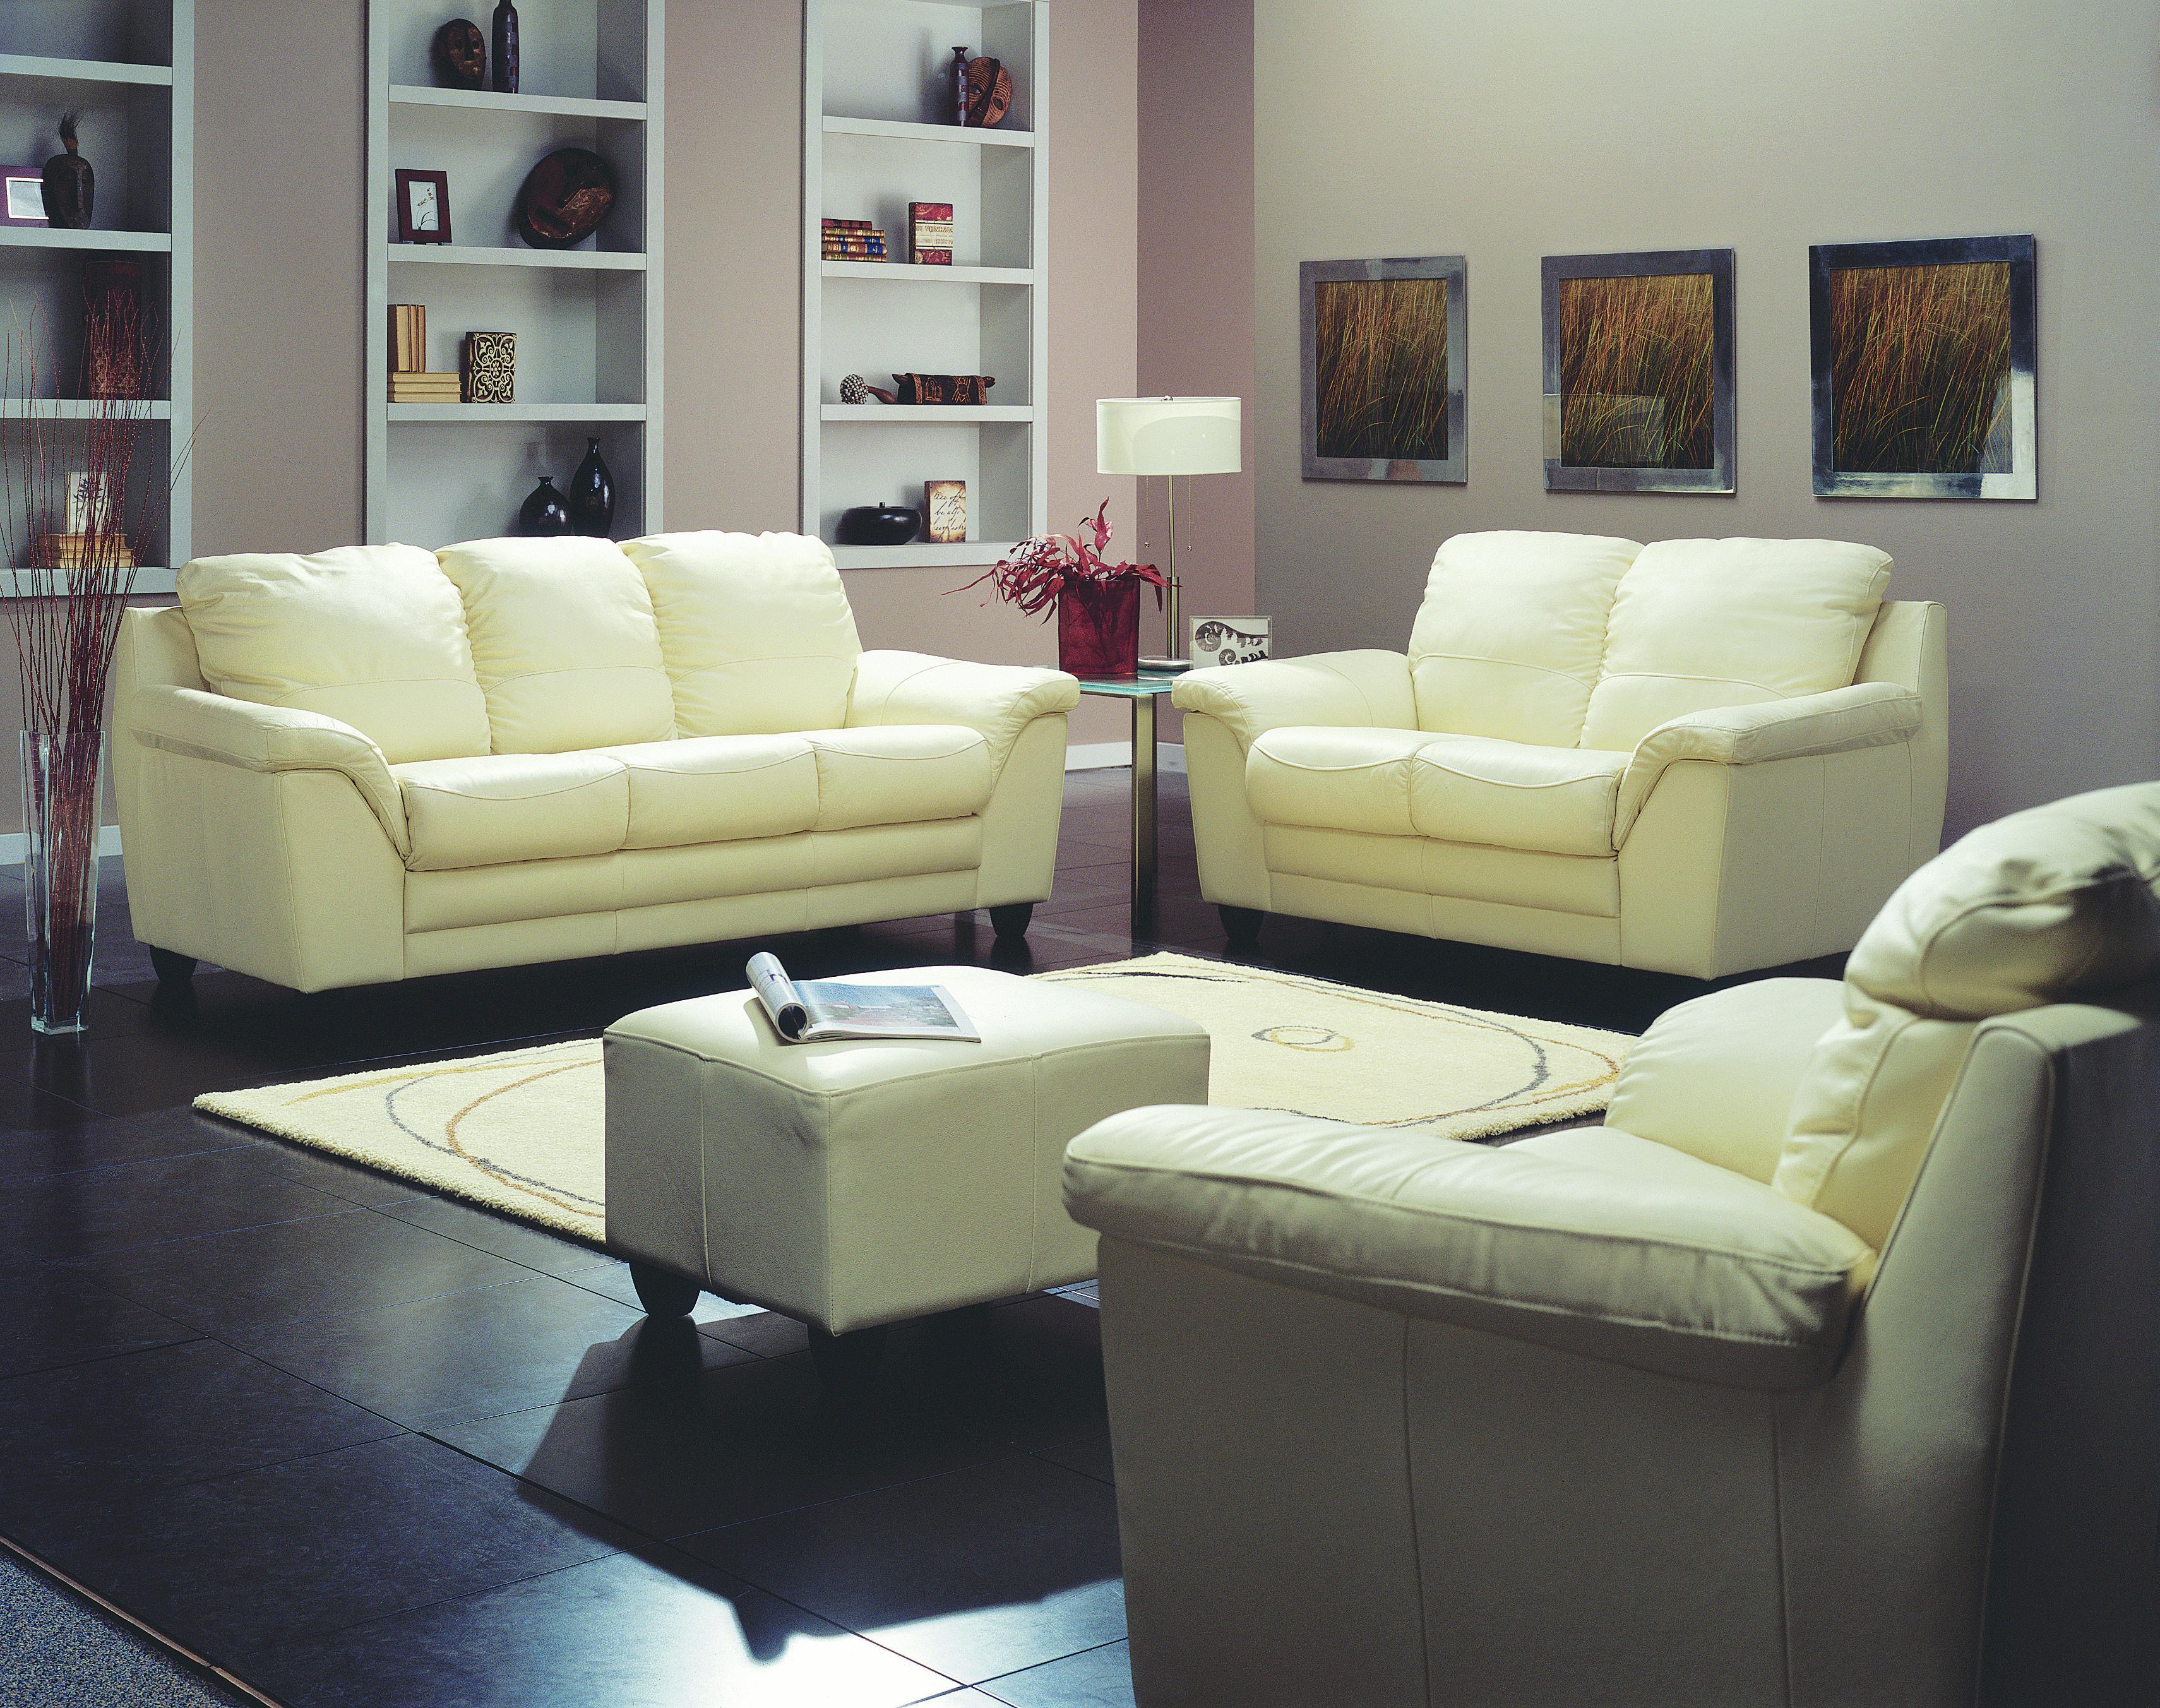 palliser stationary sofas ekeskog ikea sofa covers sirus casual with sloped pillow arms ahfa